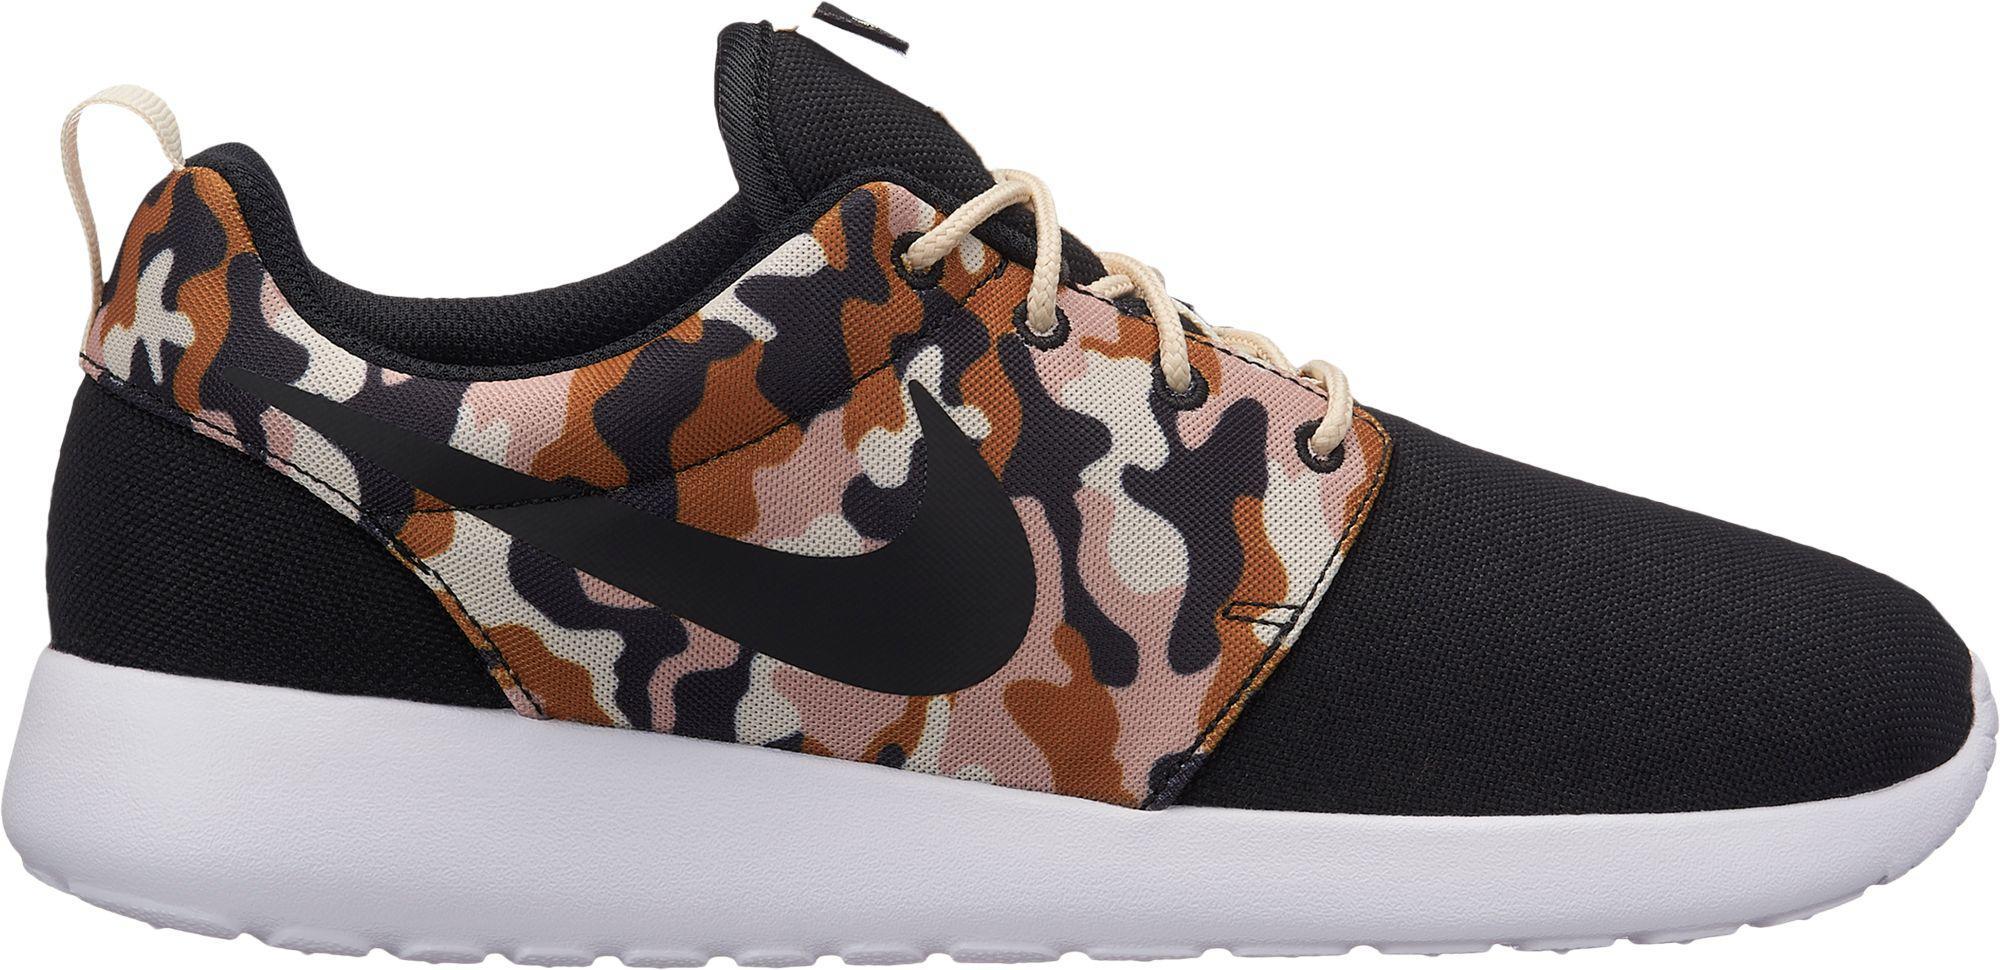 pretty nice 04c11 29120 Nike. Men s Roshe One Se Camo Shoes